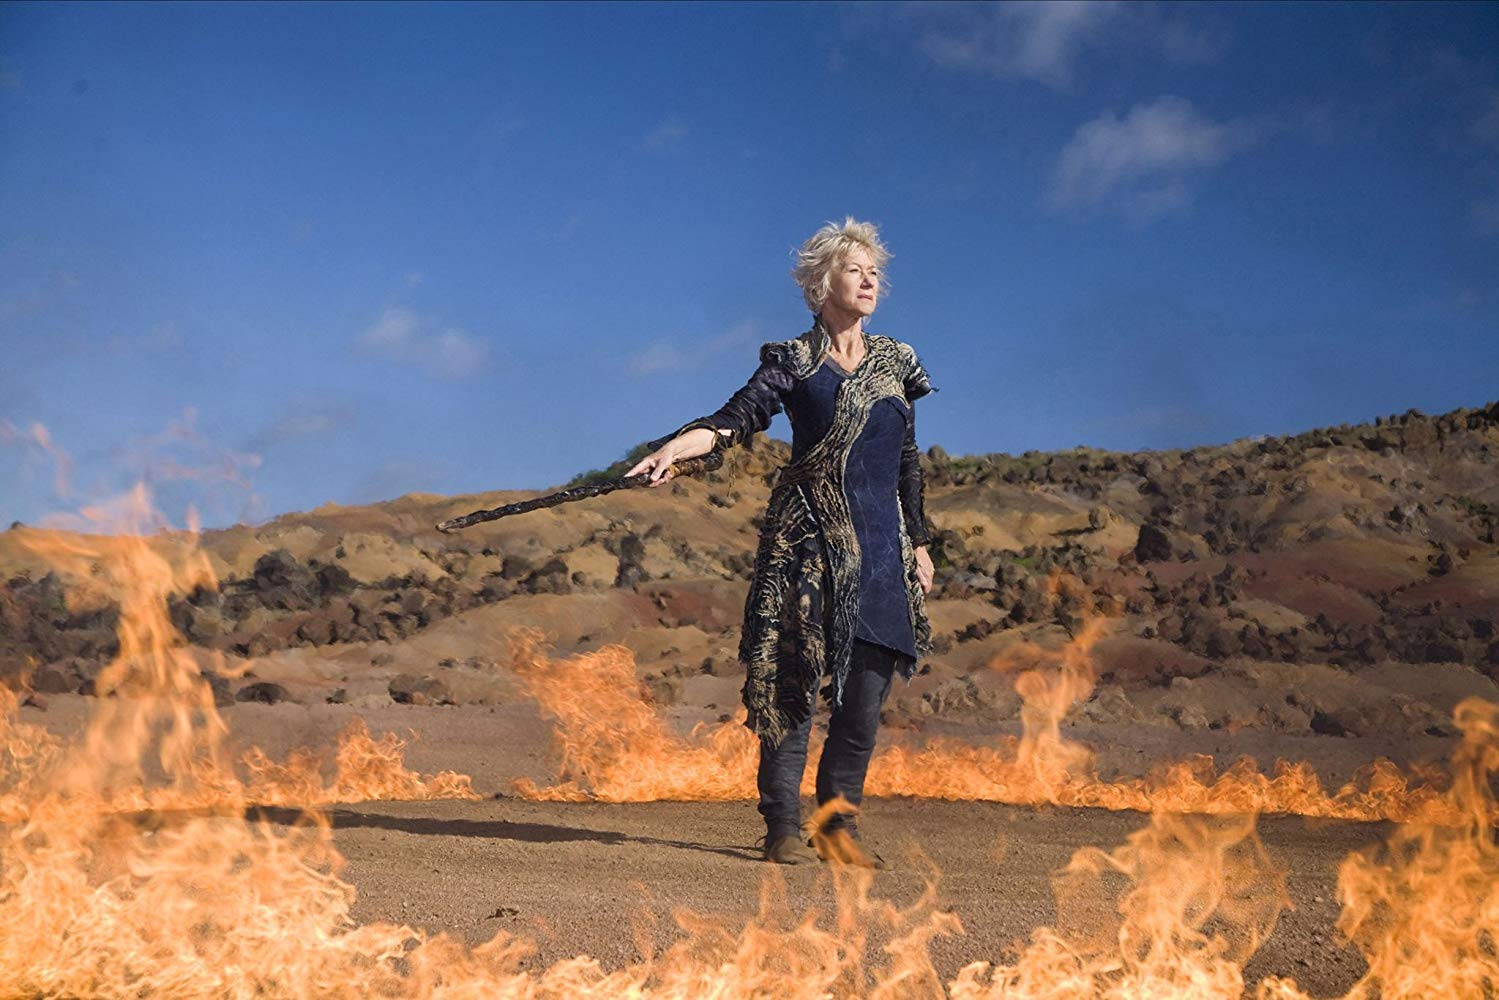 Helen Mirren as Prospera, the female Prospero in The Tempest (2010)